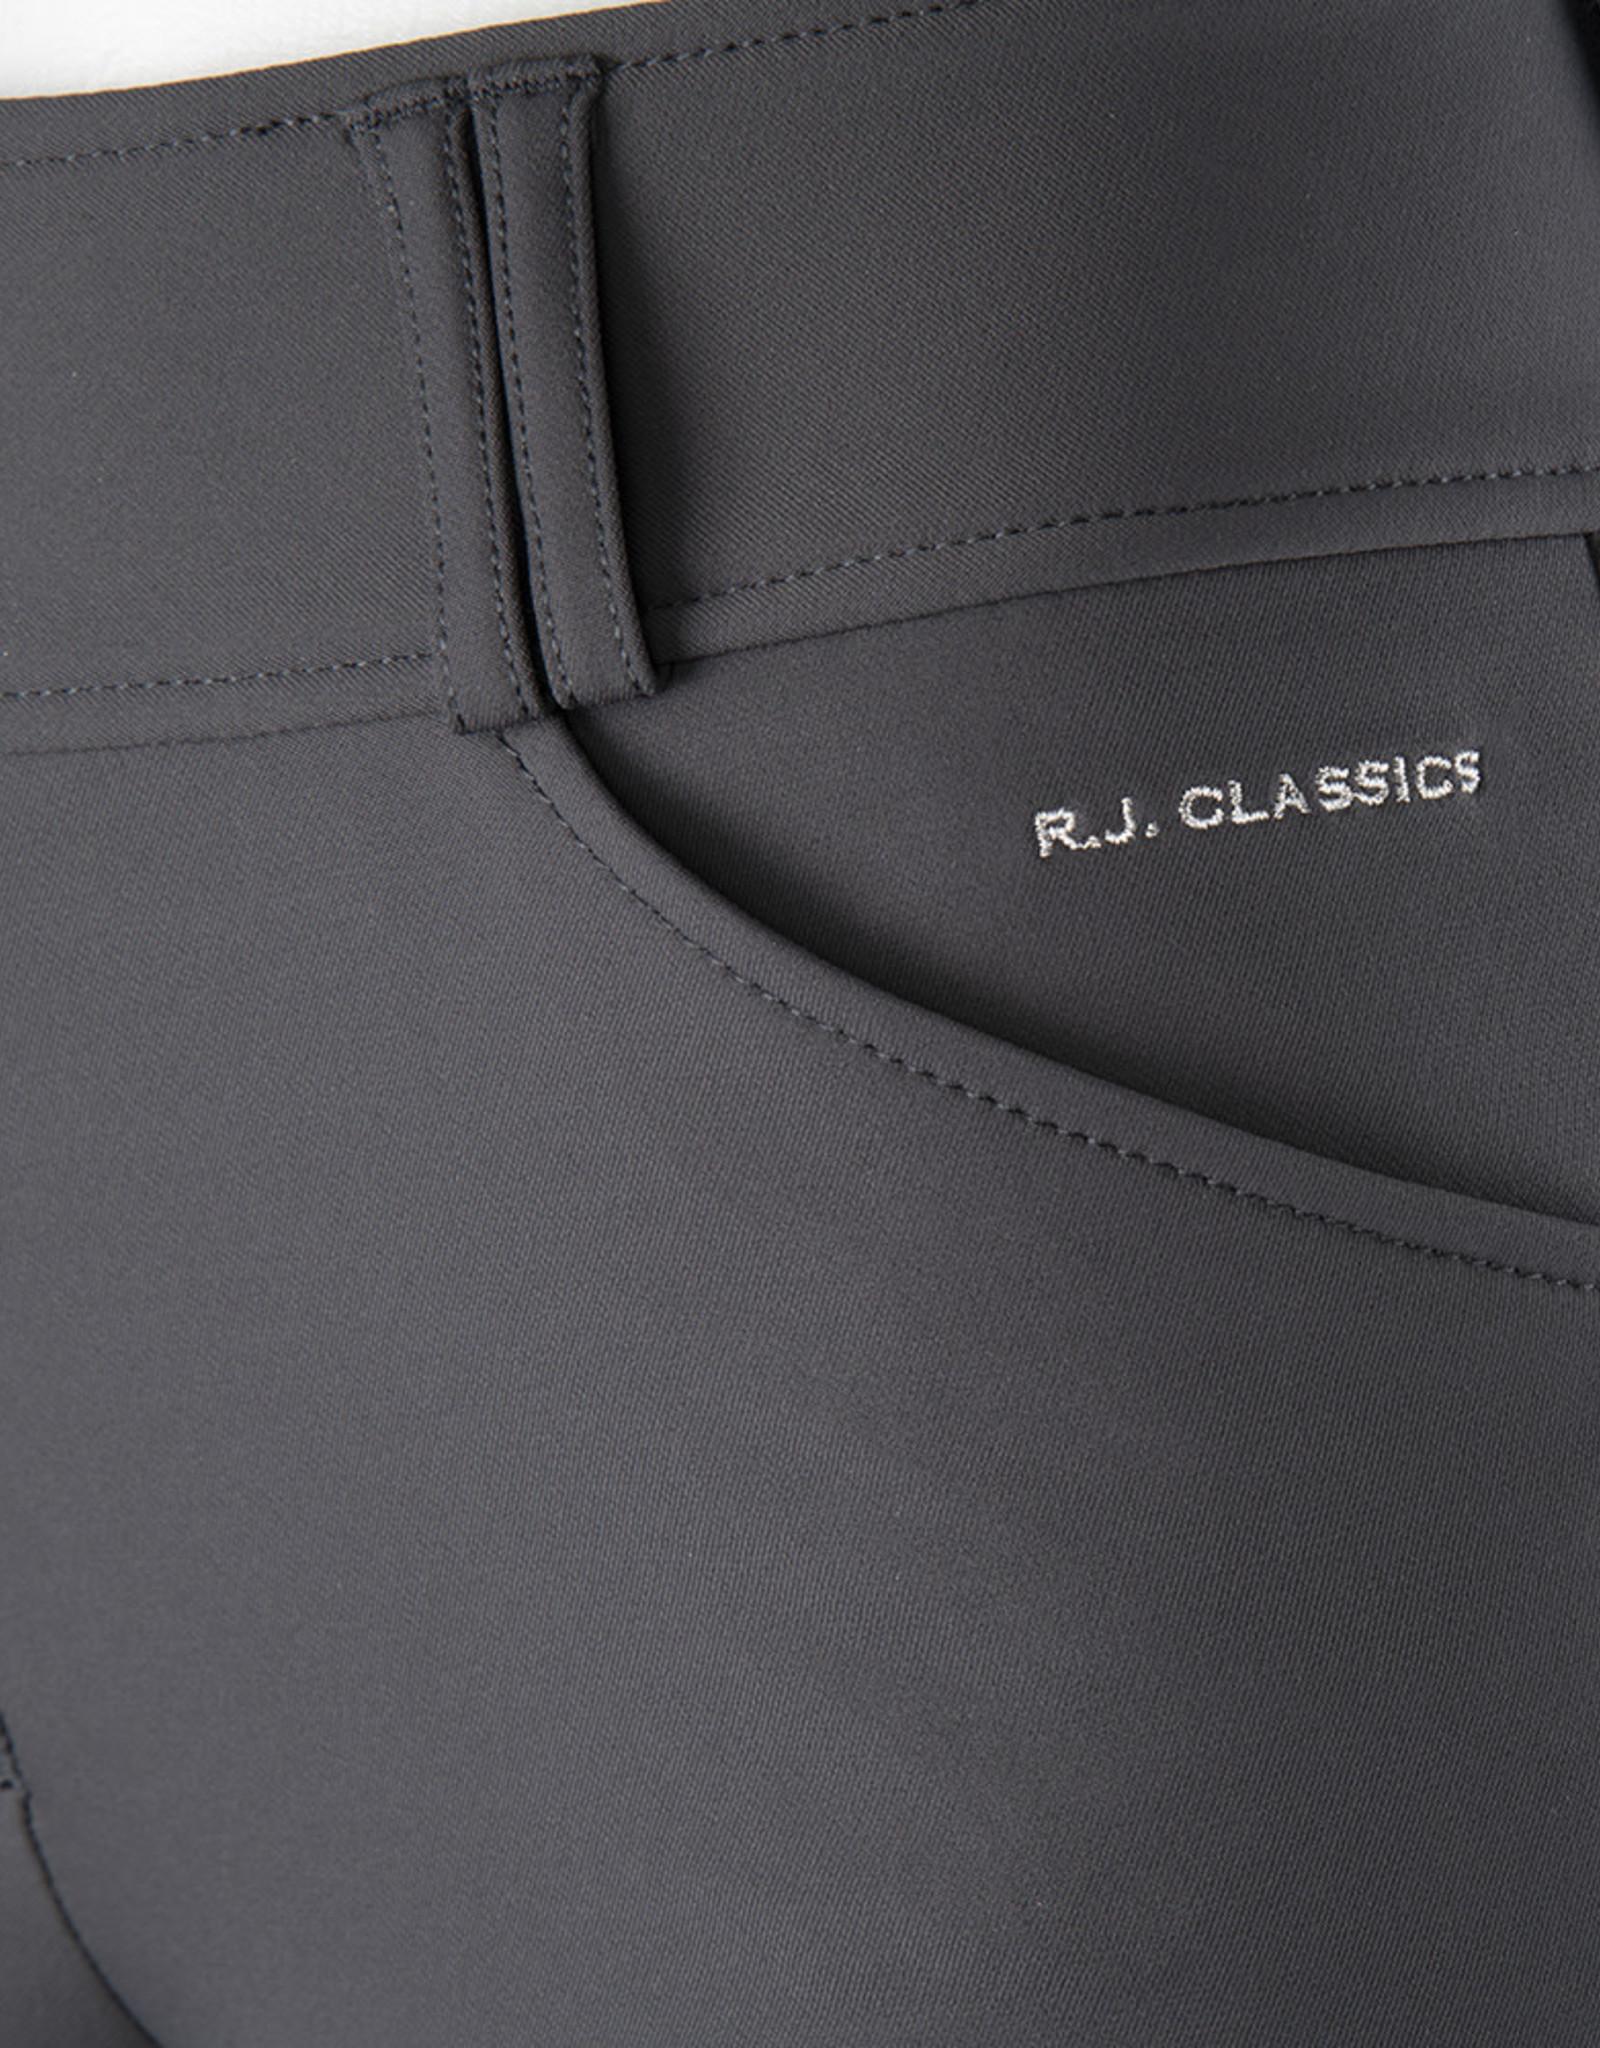 RJ CLASSICS Aria Ladies' Silicone FS Breech